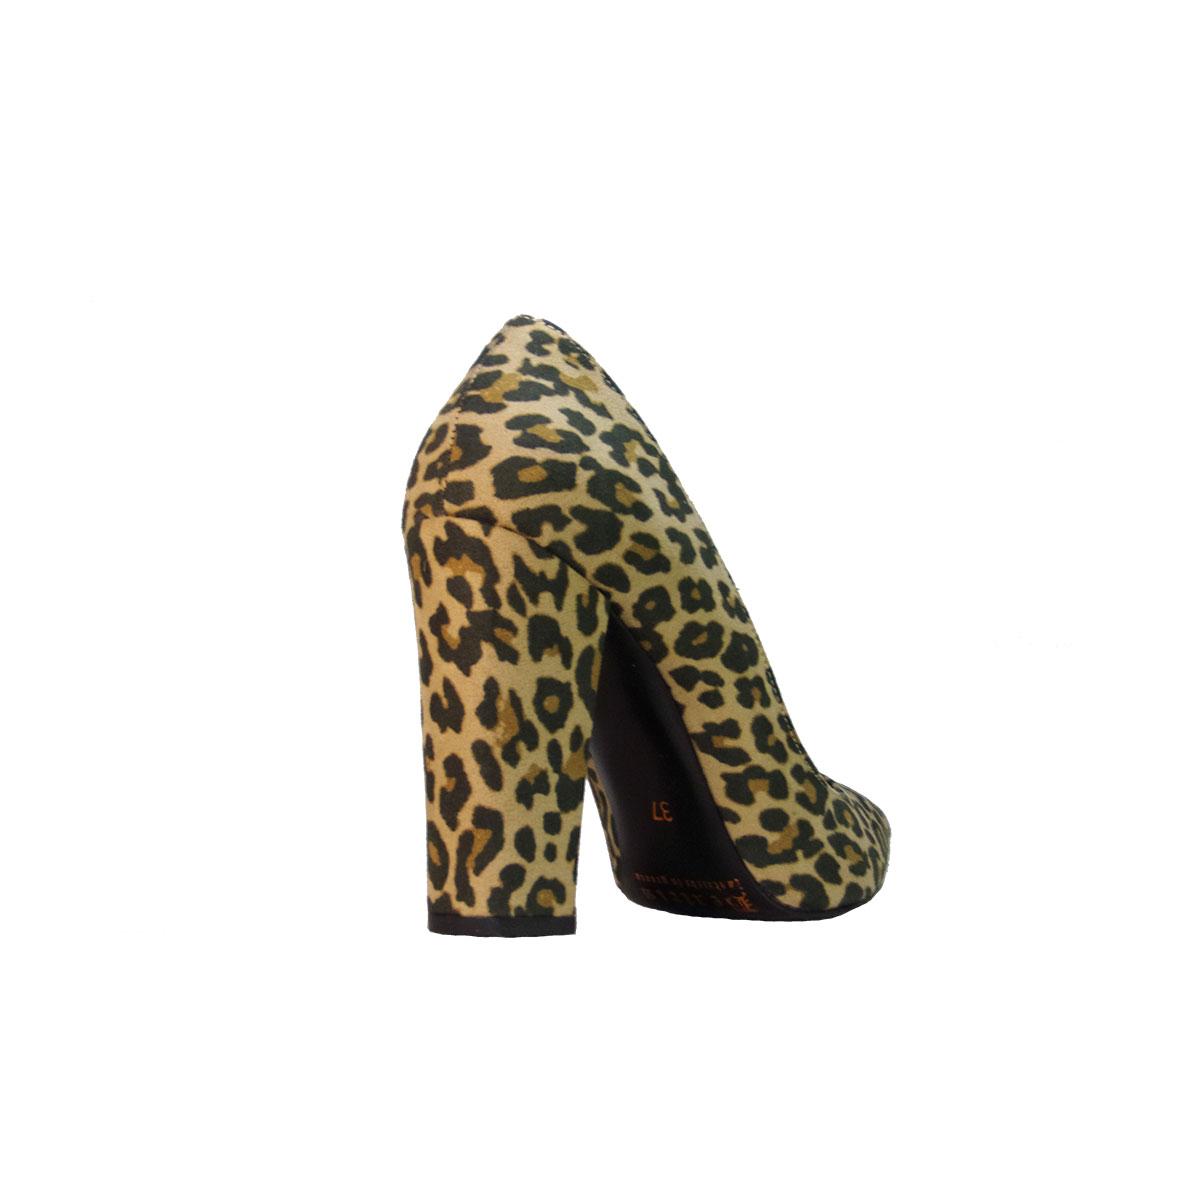 d035cc0820e Beatris EL-940 Γυναικεία Γόβα Χοντρό Τακούνι Λεοπάρ – ILoveMyShoes